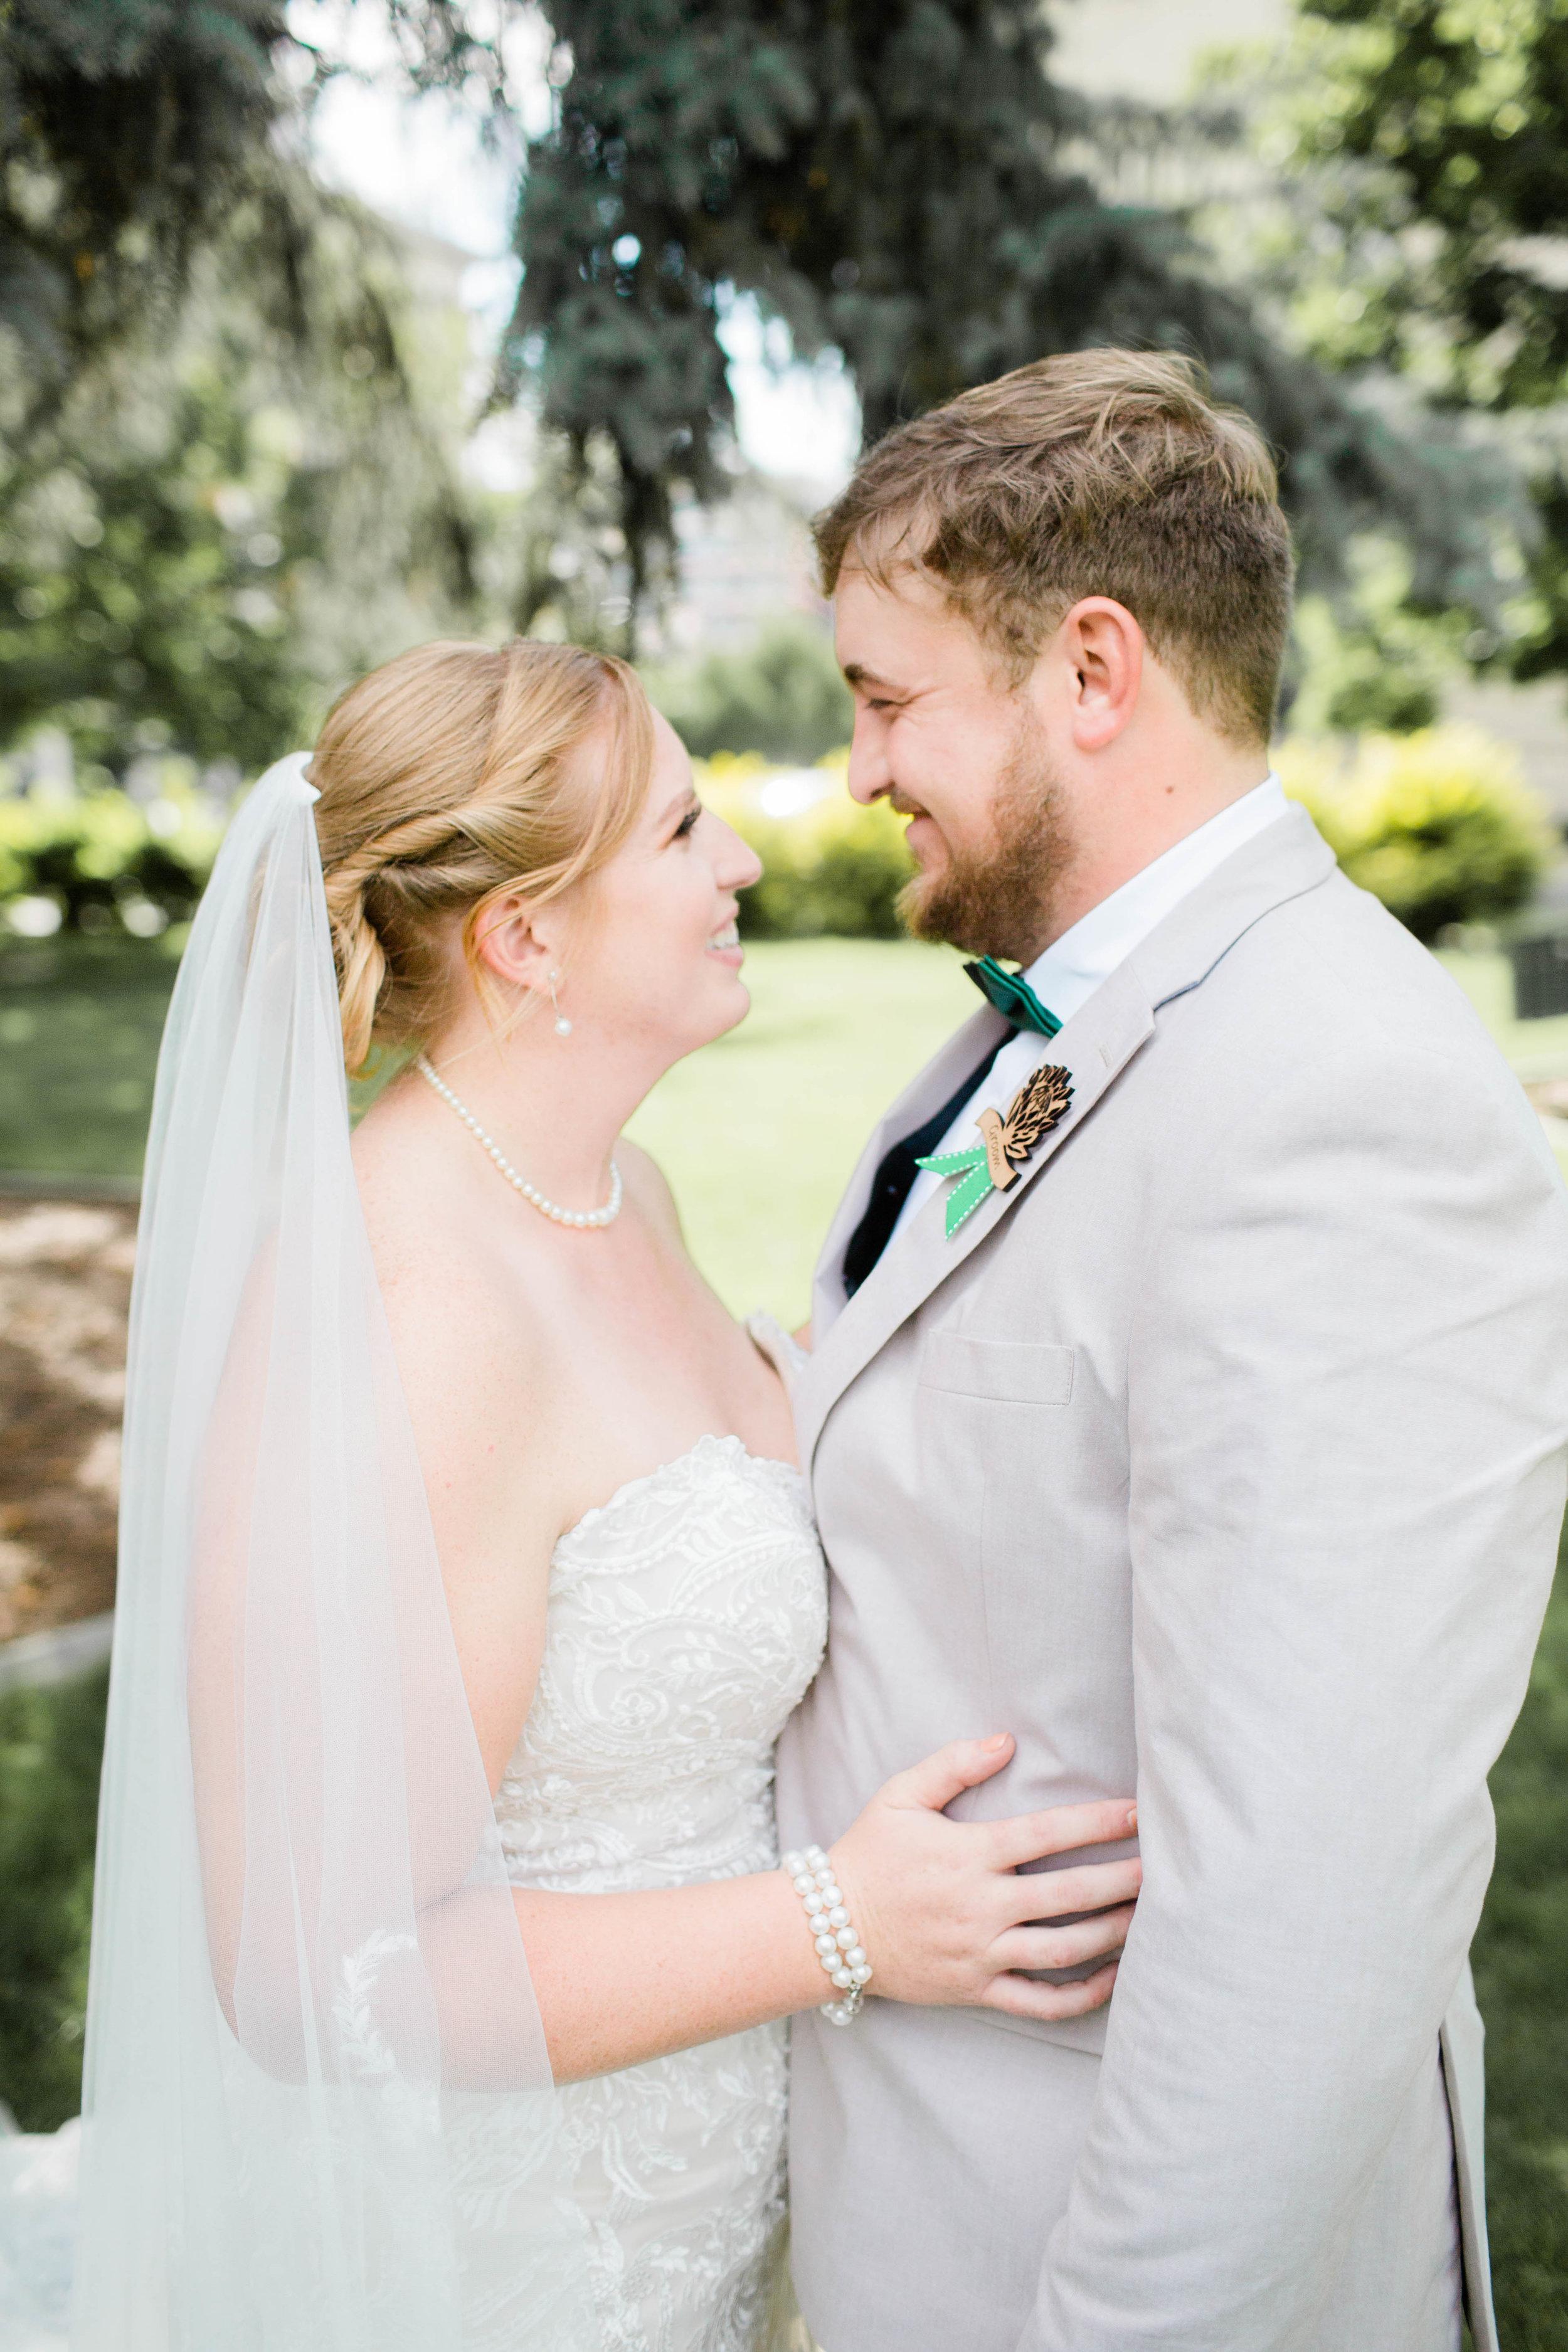 C-Lydia-Rohan-Downtown-Boise-Wedding-61.jpg